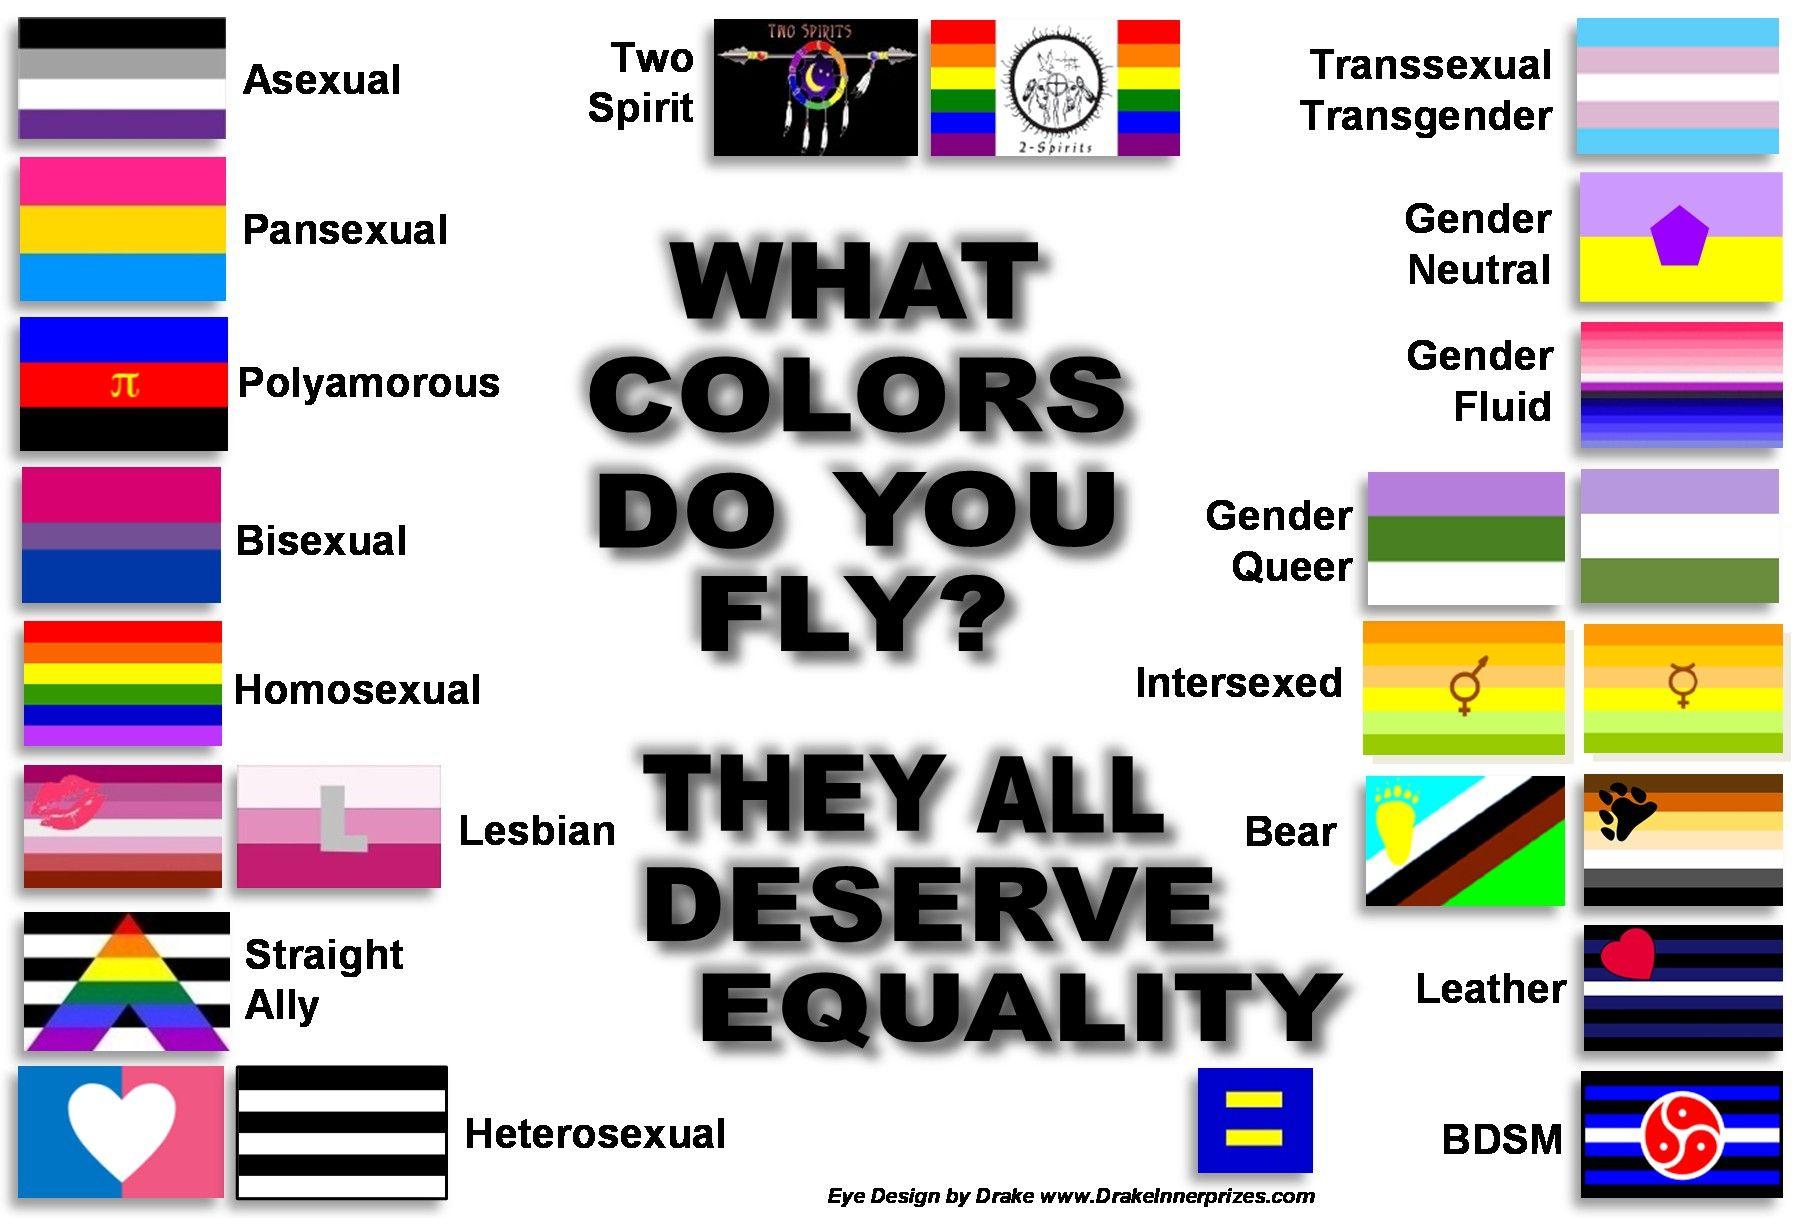 Gender nonconforming heterosexual meaning